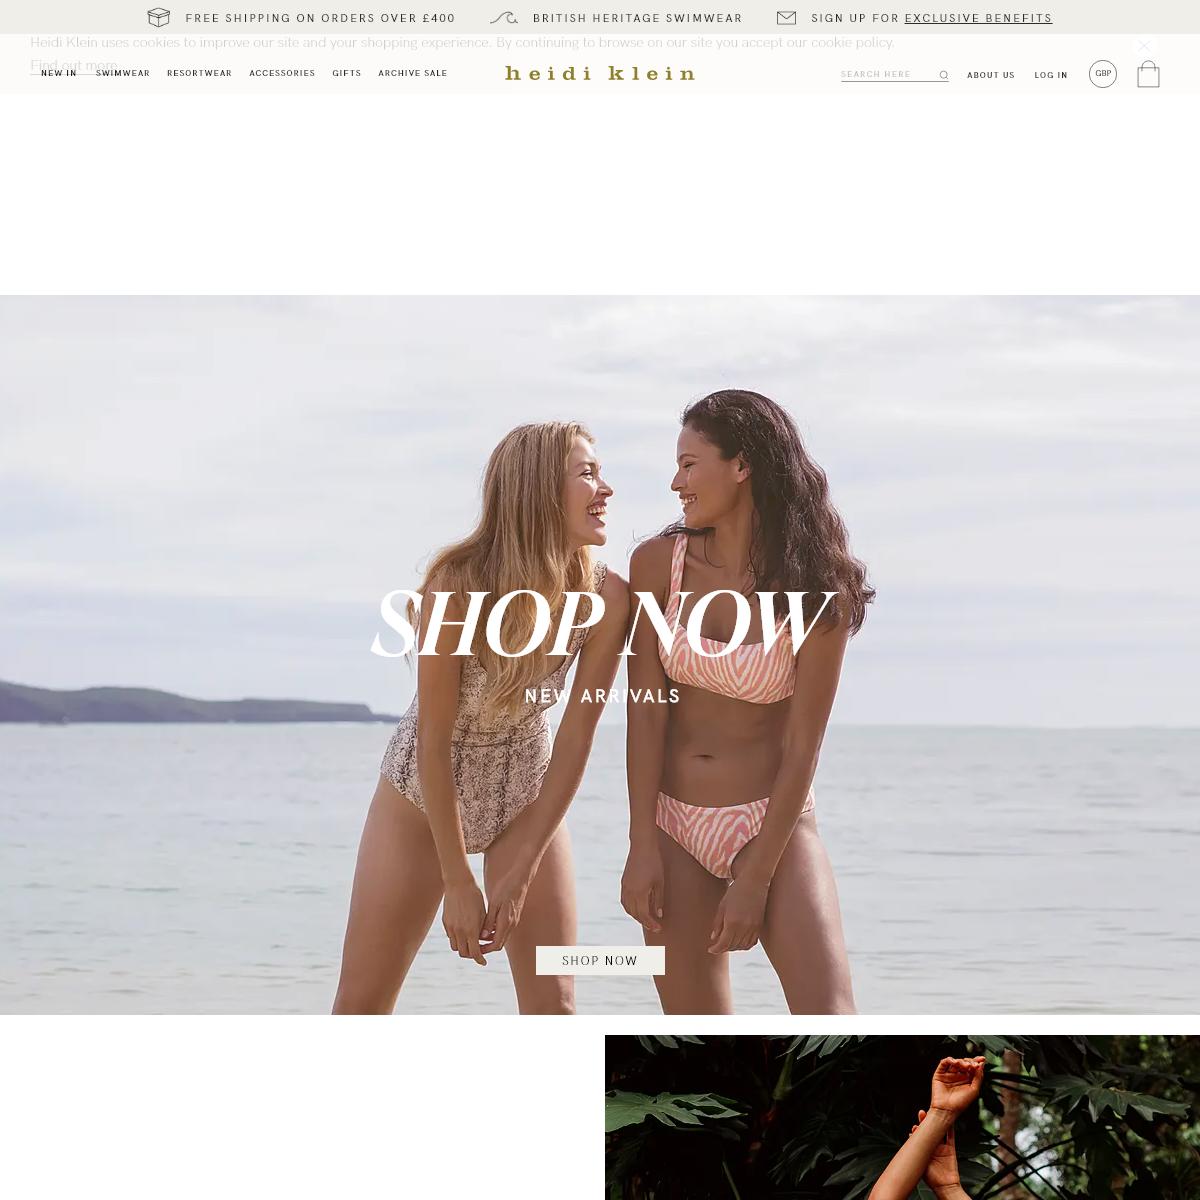 Designer Beachwear and Swimwear - Heidi Klein - Free Shipping